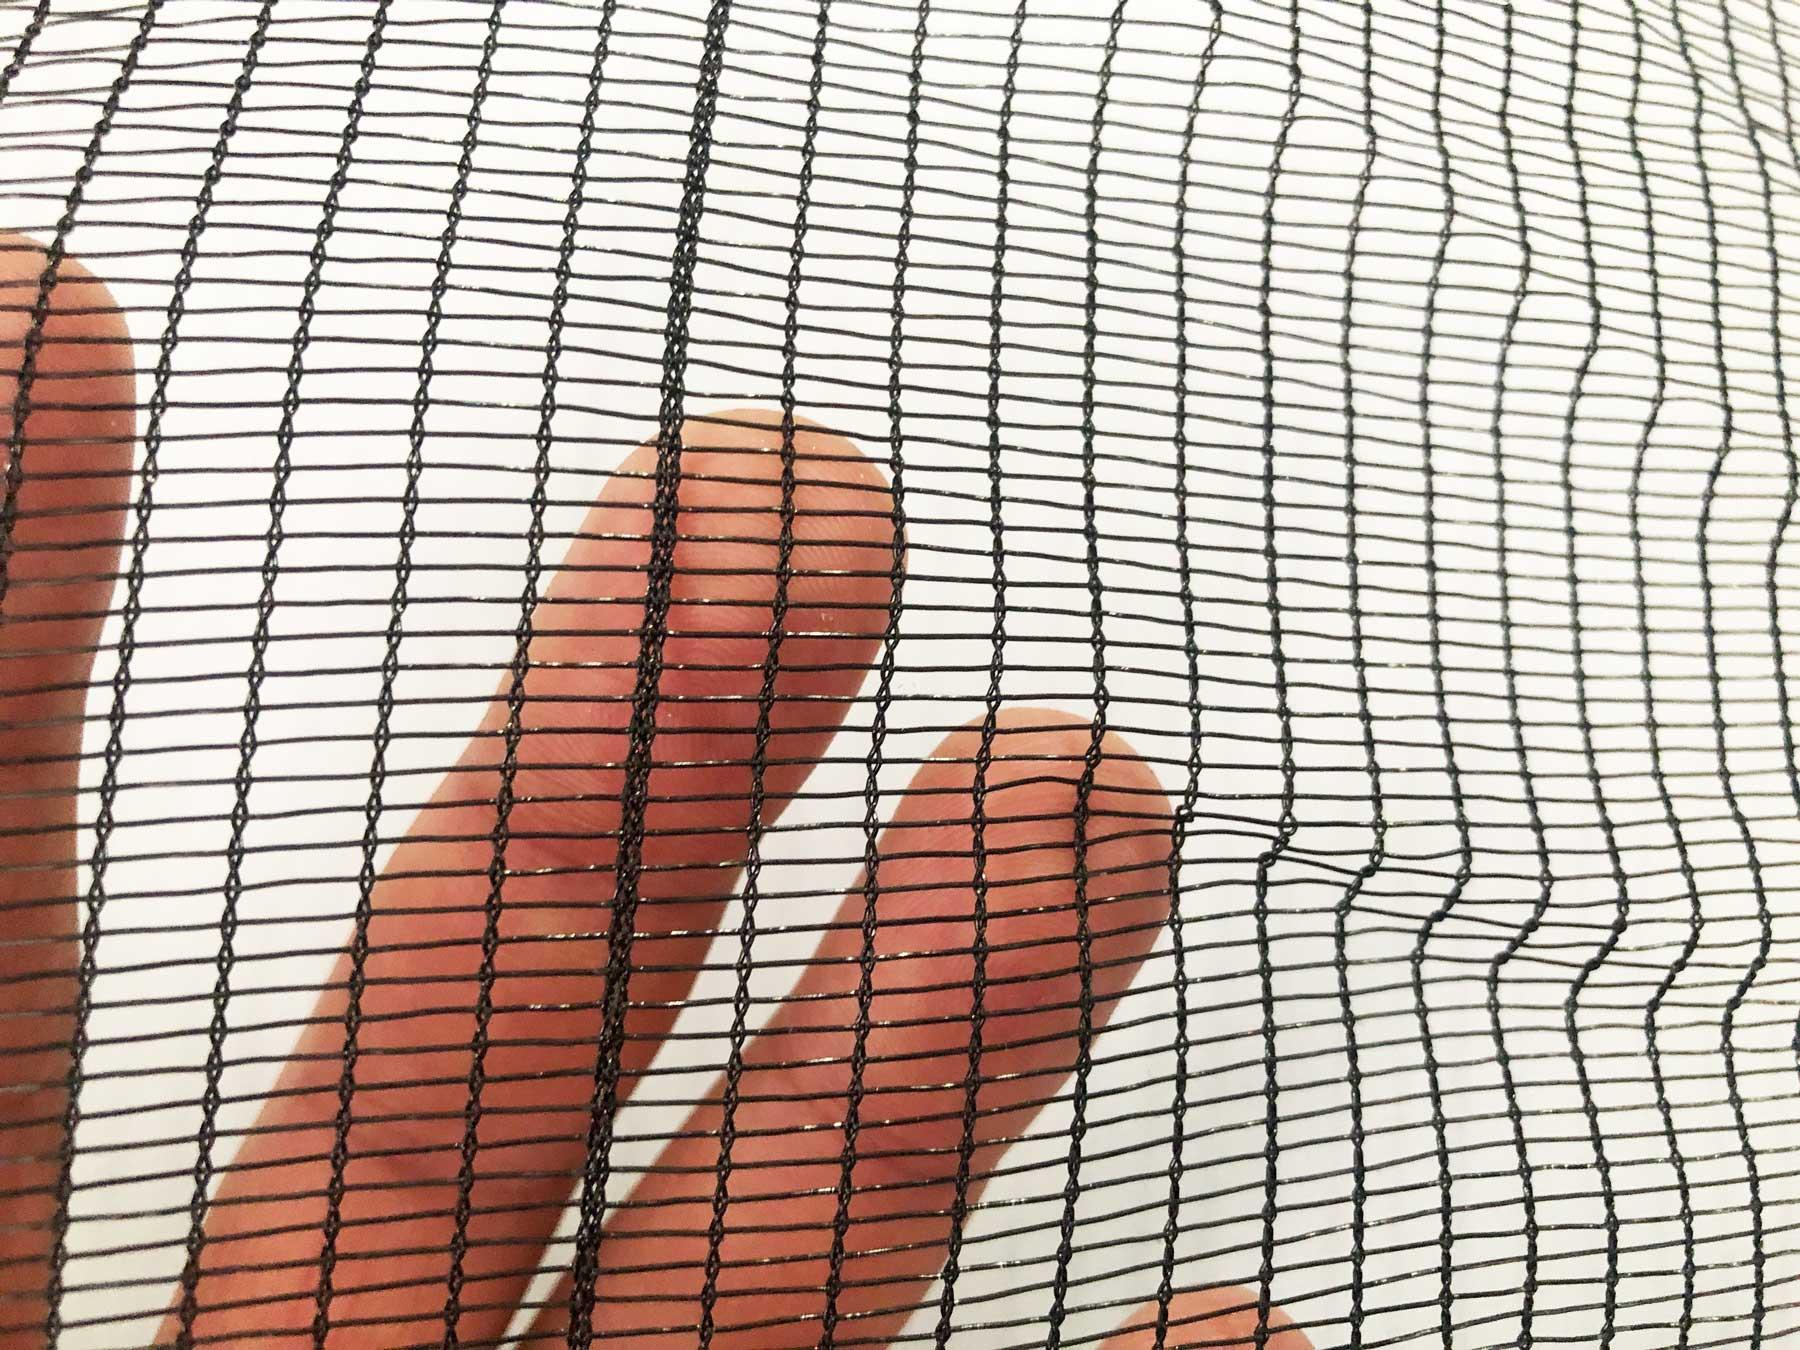 Tela Sombrite Nylon Monofilamento com Giro Inglês 50% 3x30